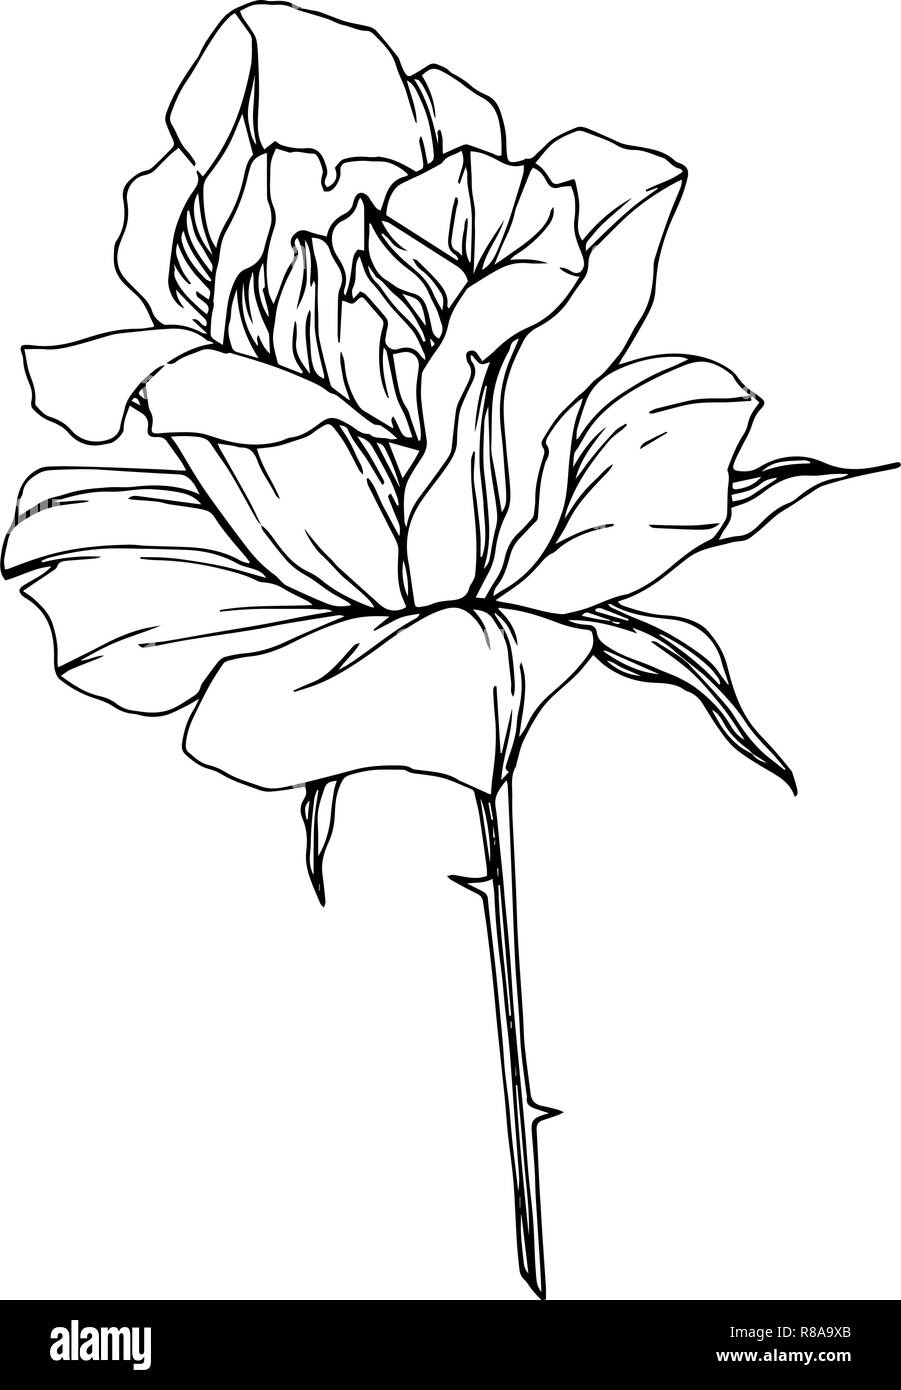 Vector Rose Floral Botanical Flower Black And White Engraved Ink